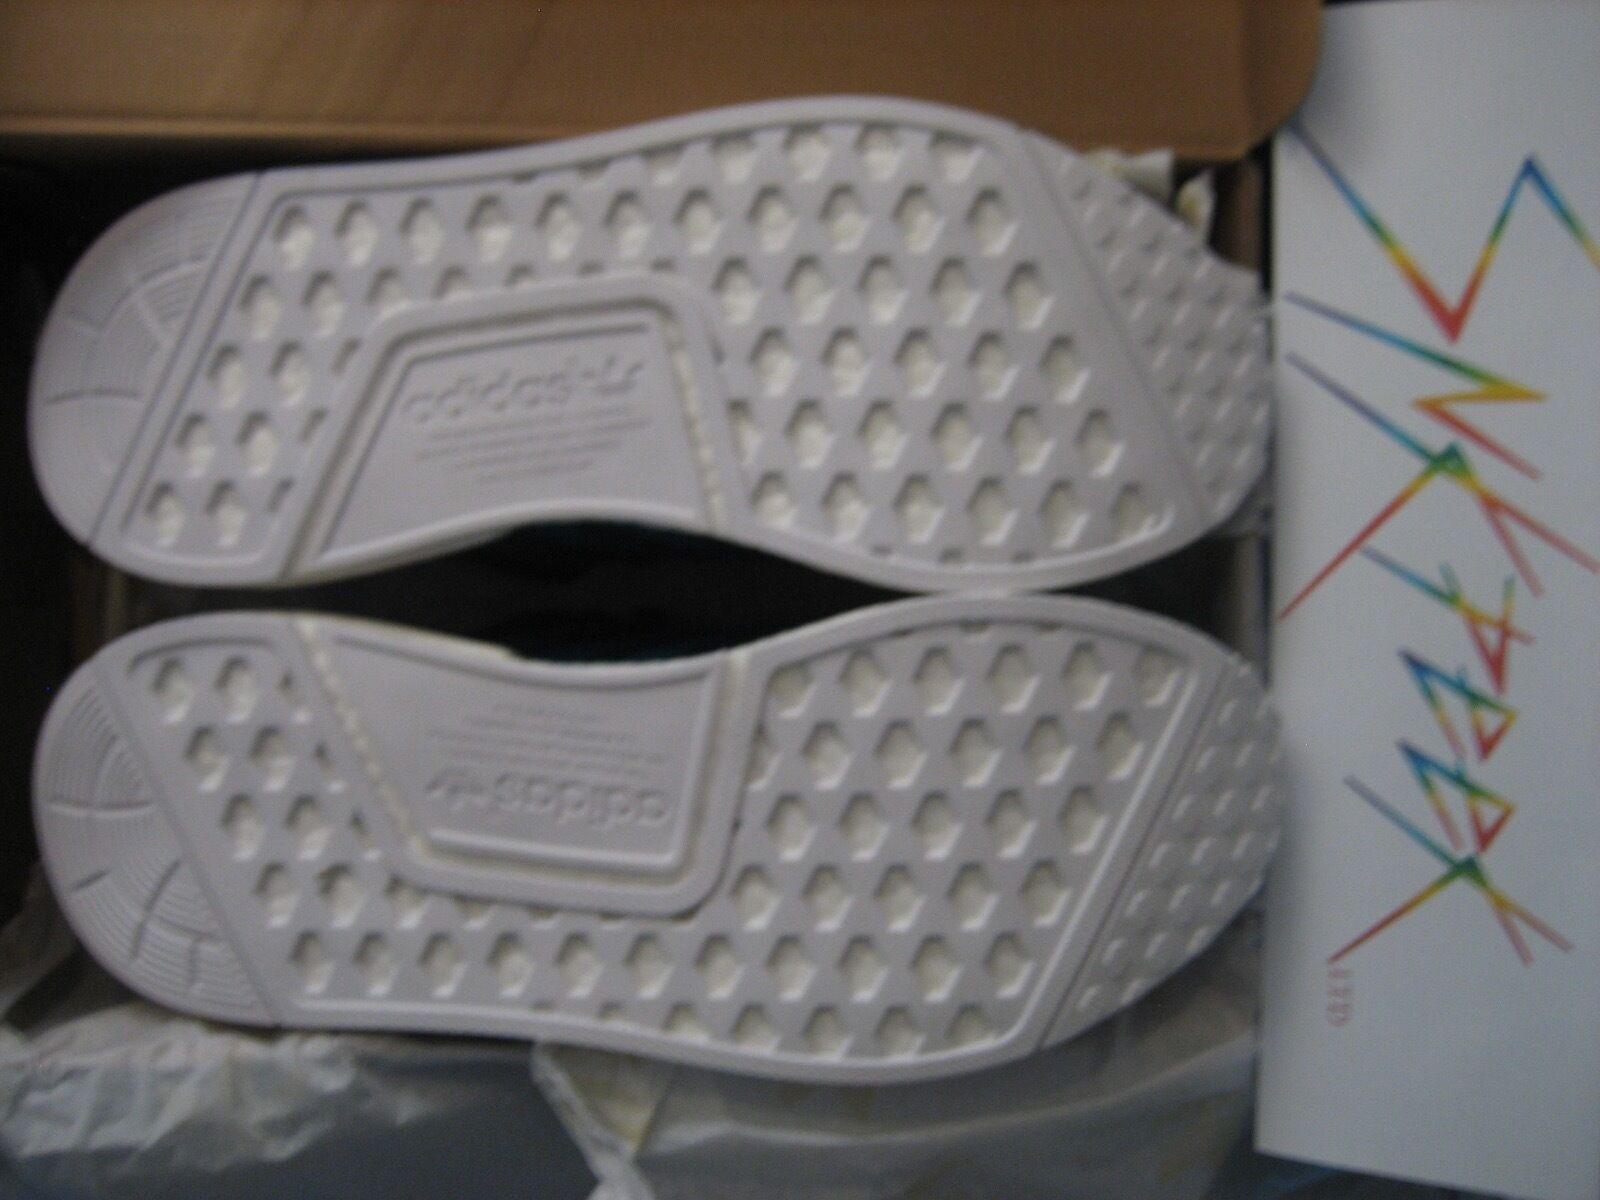 Adidas nmd r1 mesh - stahl / uni uni / - blau - weißer s31502 männer uns 10 erhöhen. bd1f83